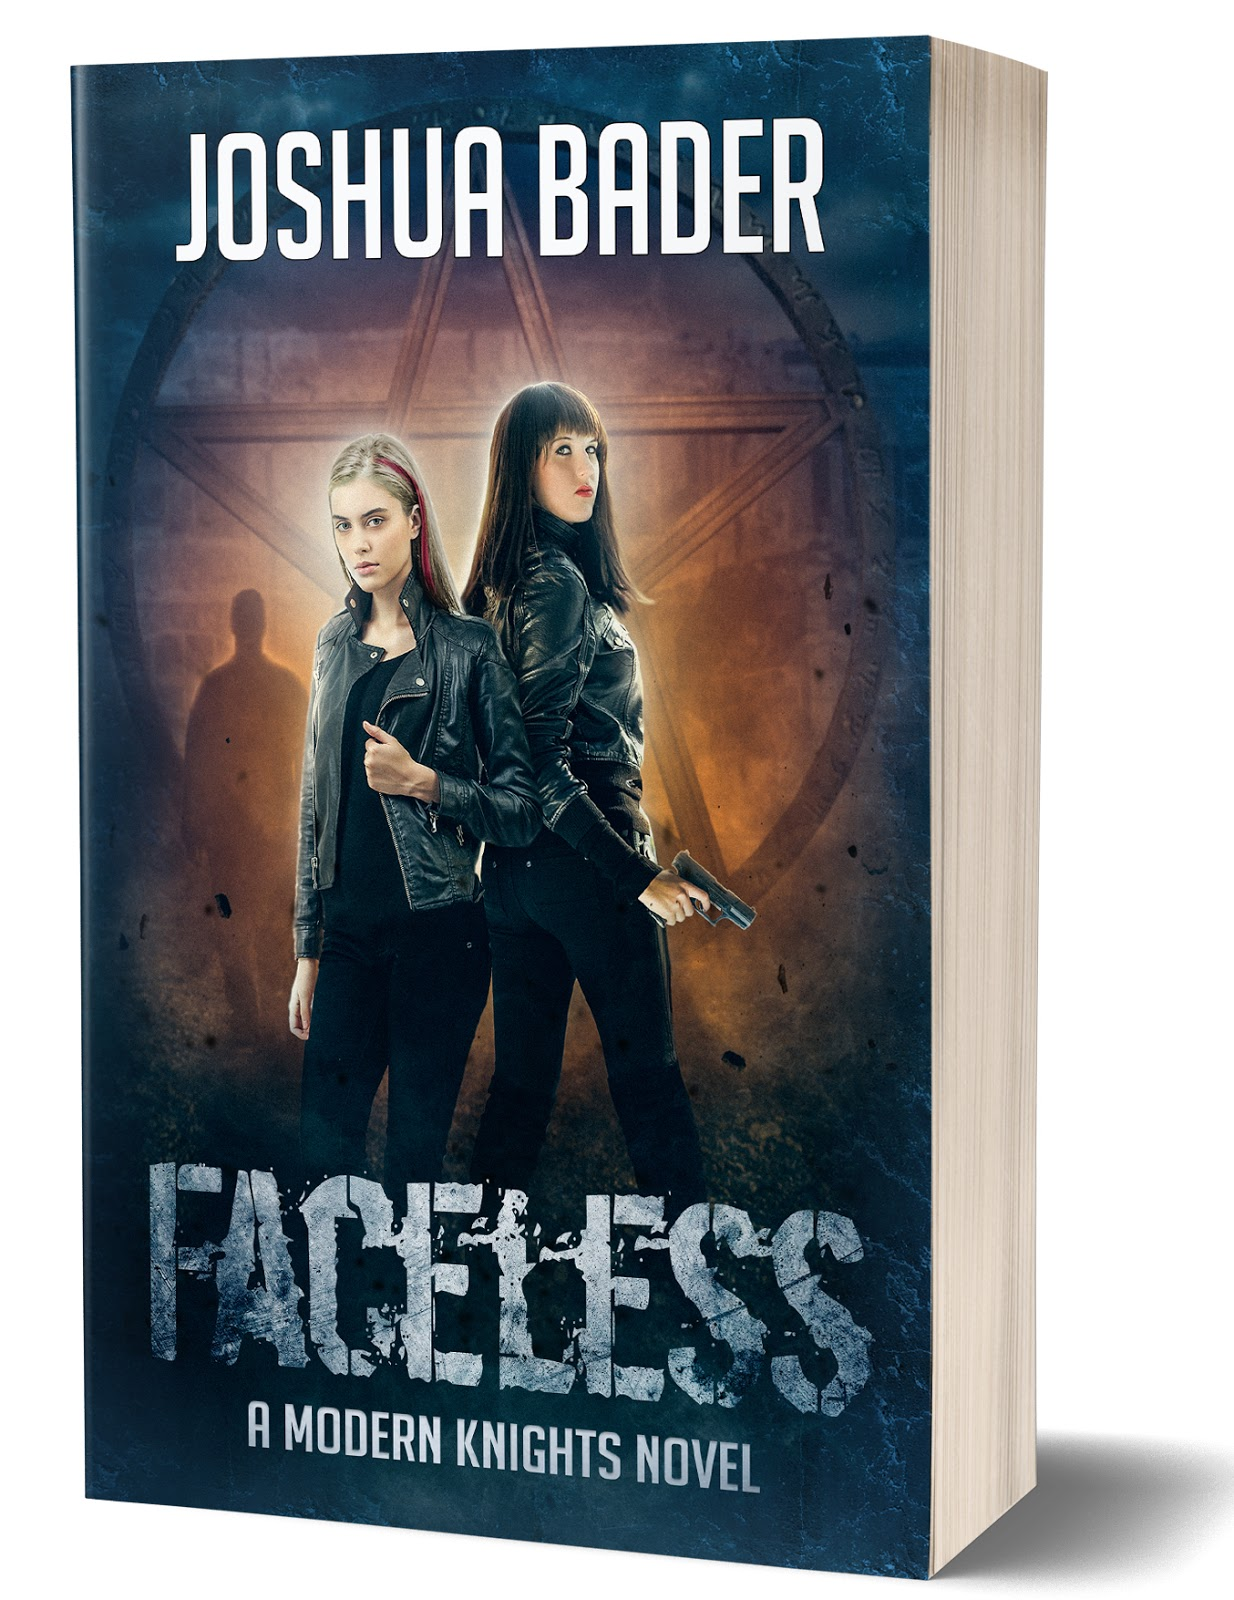 http://www.cityowlpress.com/2018/07/faceless.html